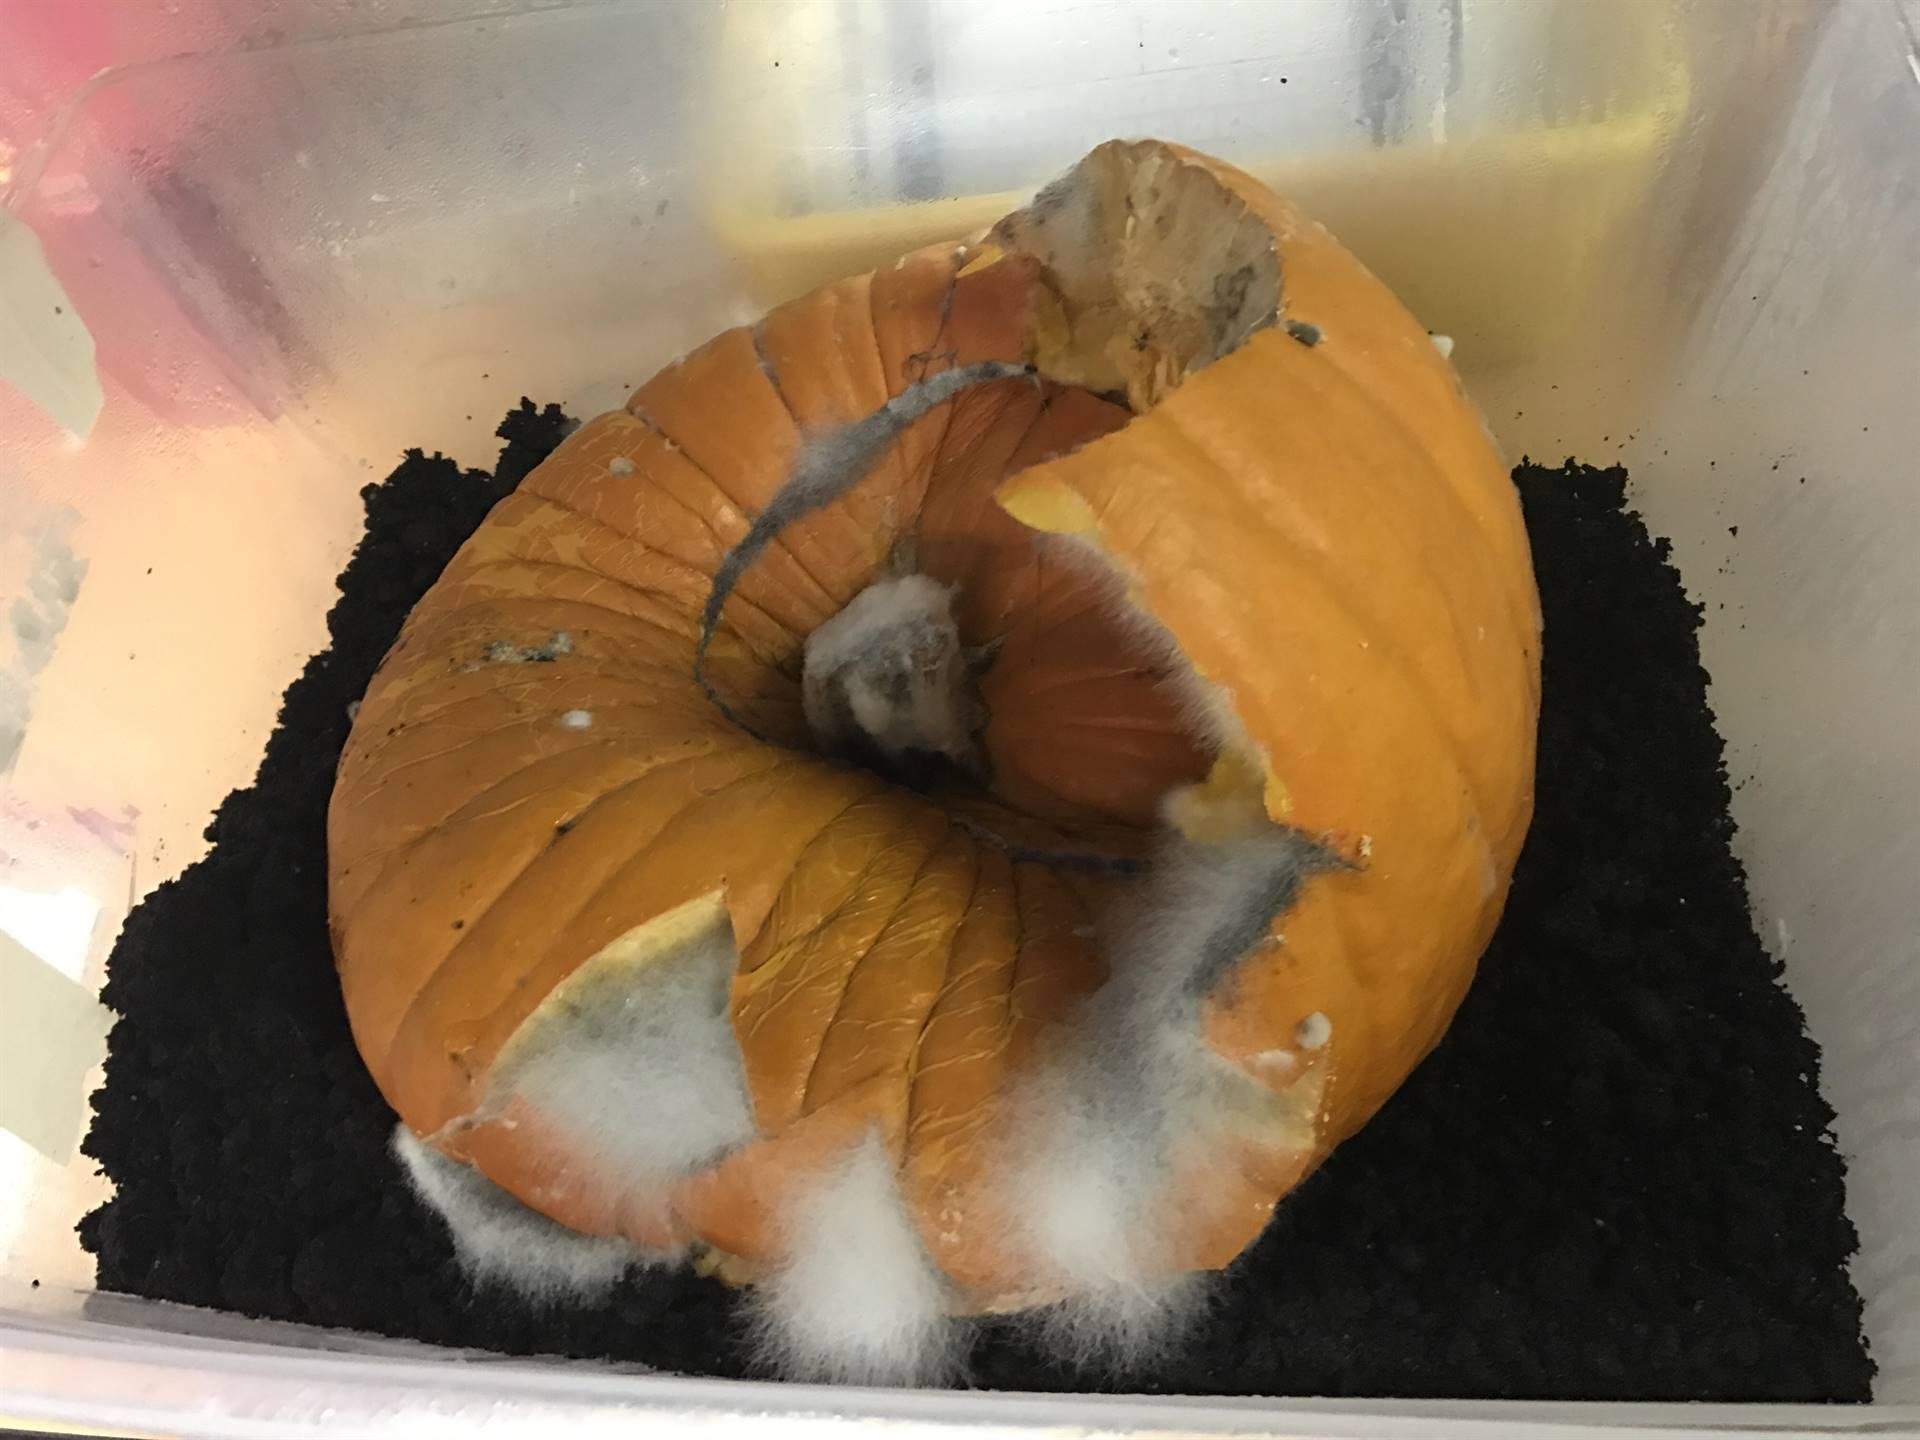 Day 6 of Pumpkin Jack-Top View